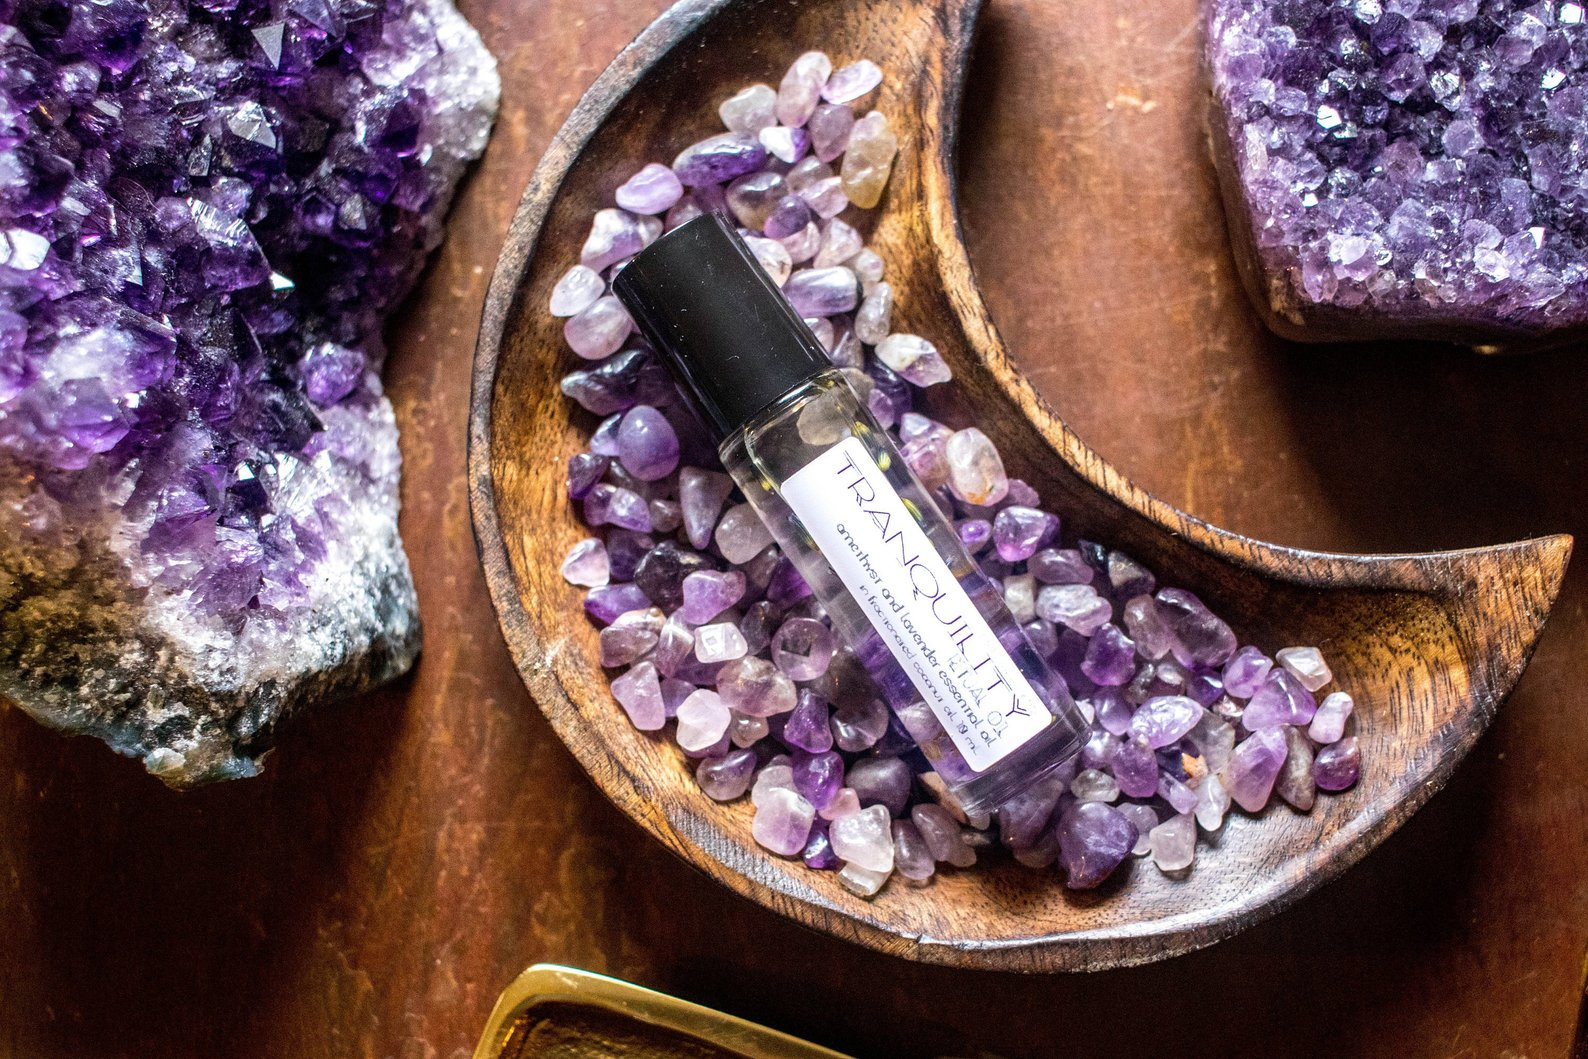 Amethyst + Lavender Tranquility Essential Oil Roller By Mandala Gems